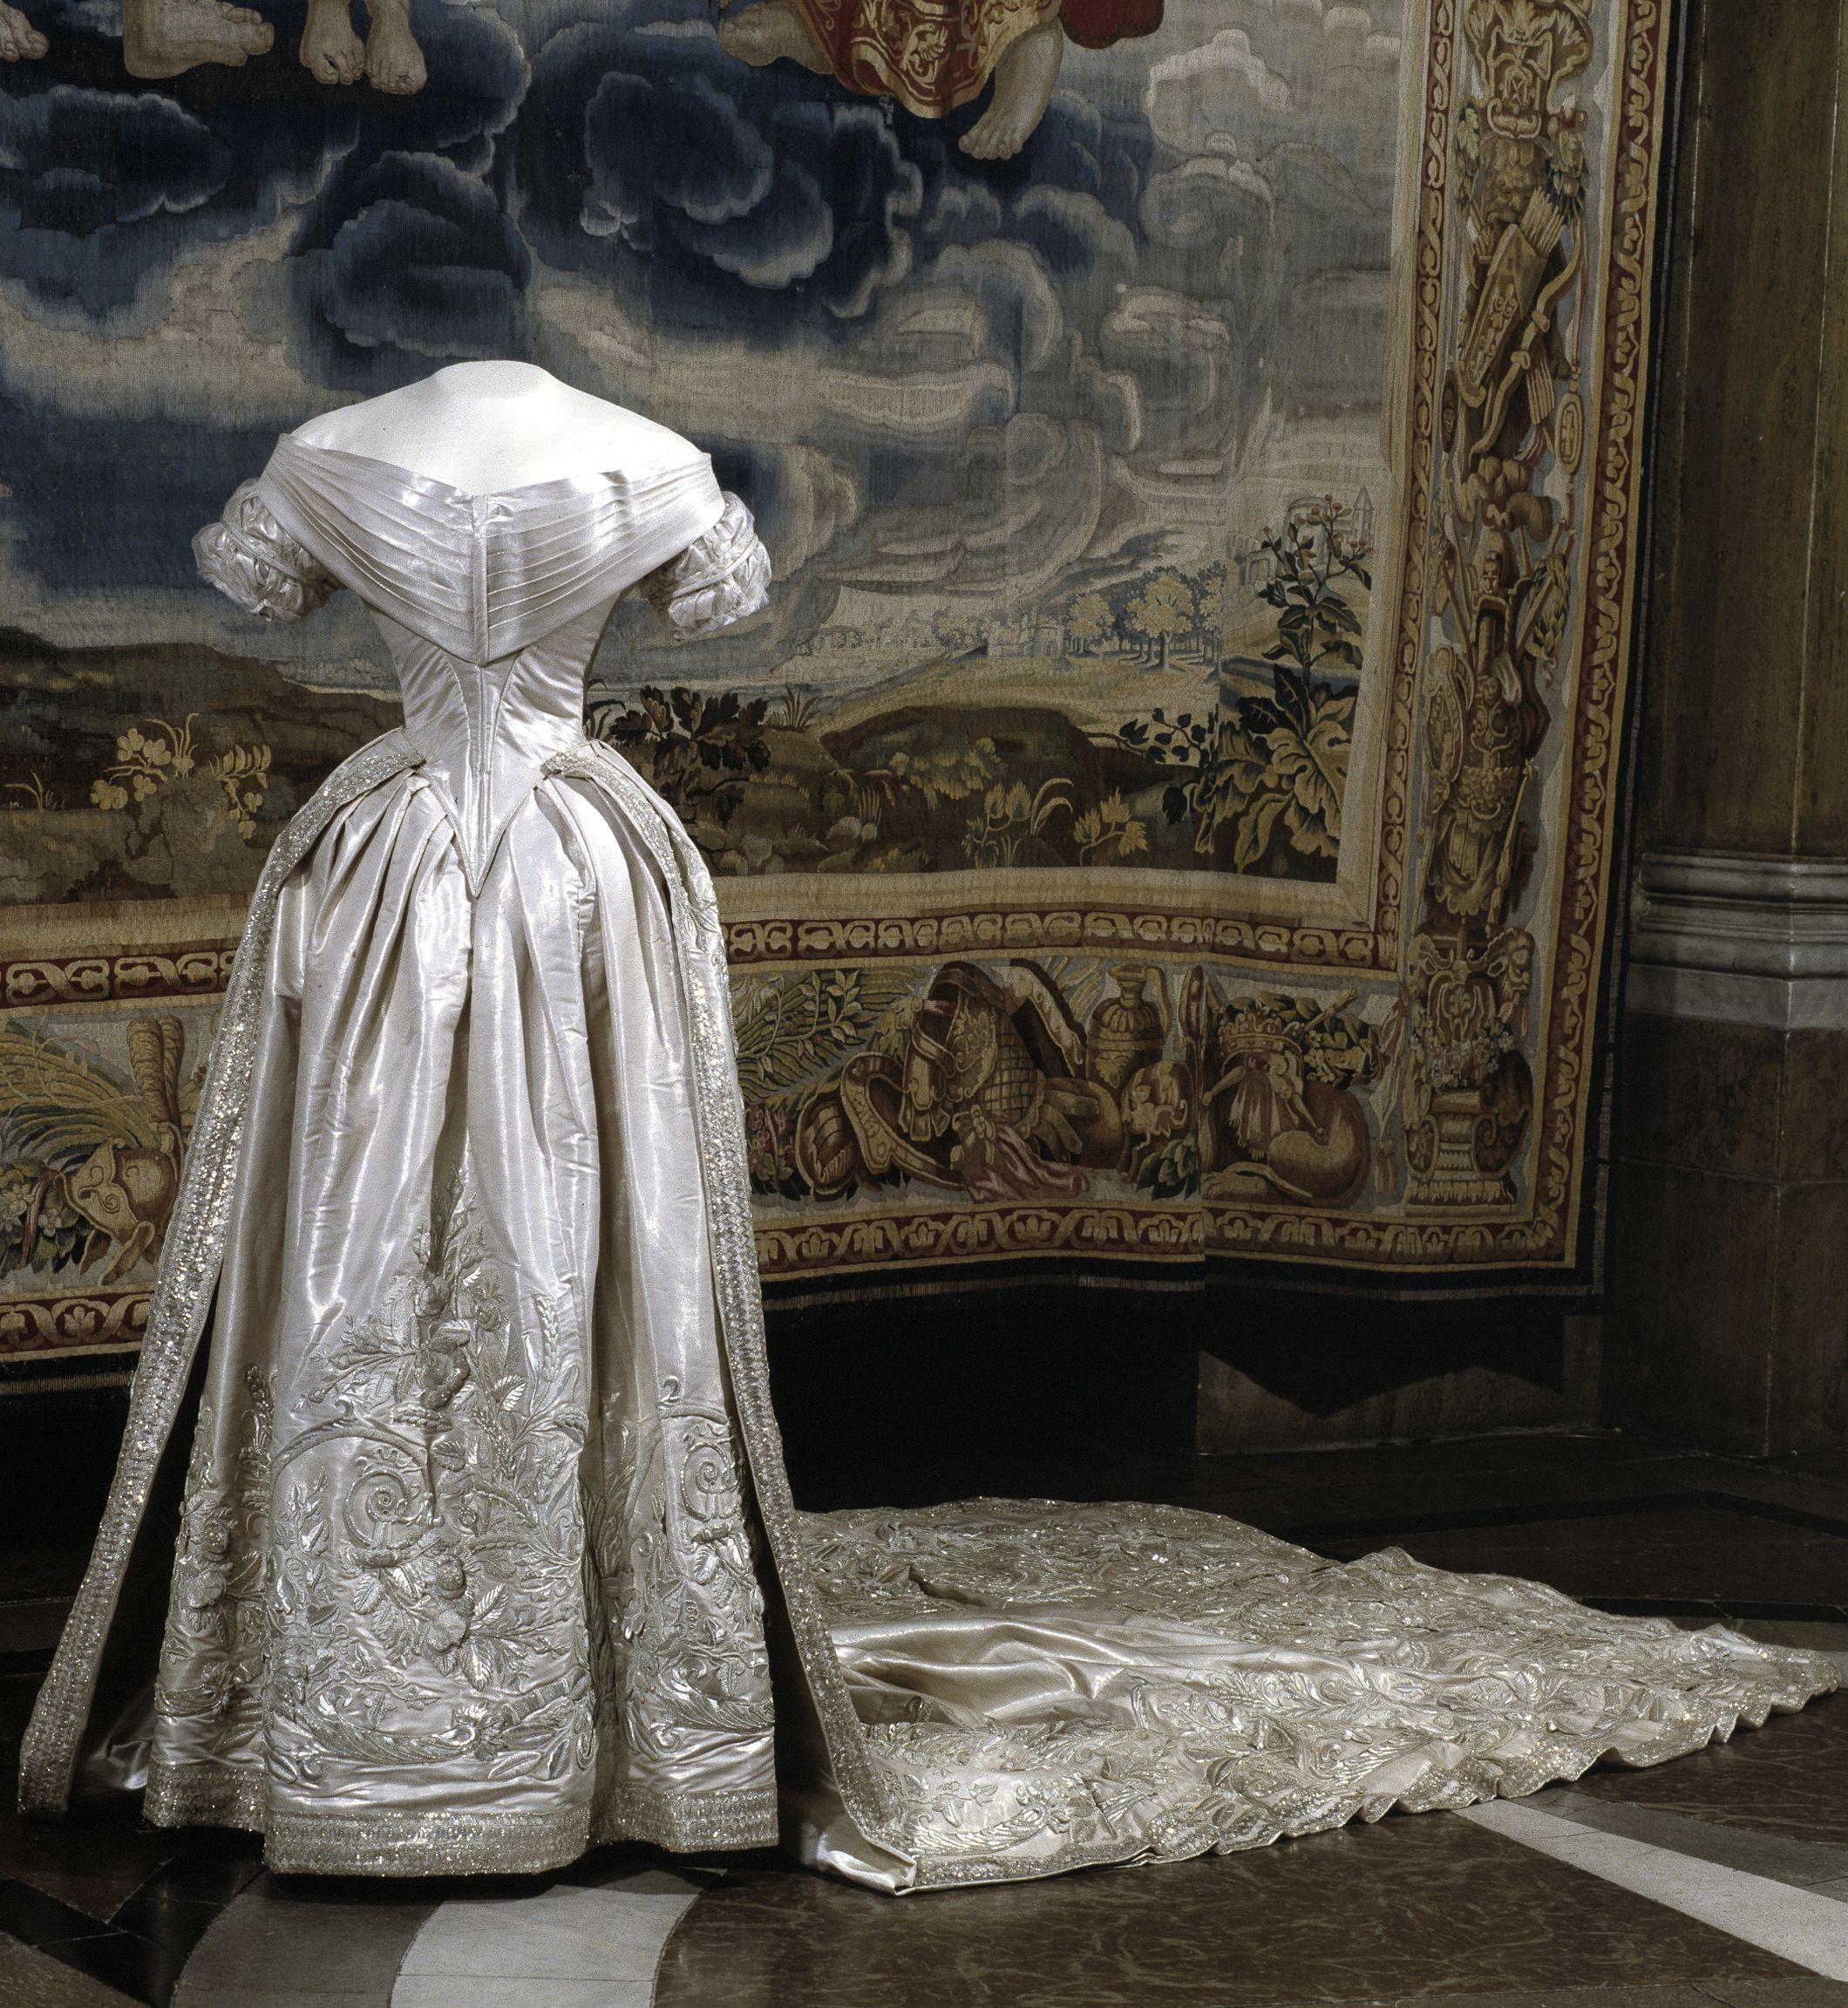 wedding dress (bodice, skirt, train) of queen lovisa of